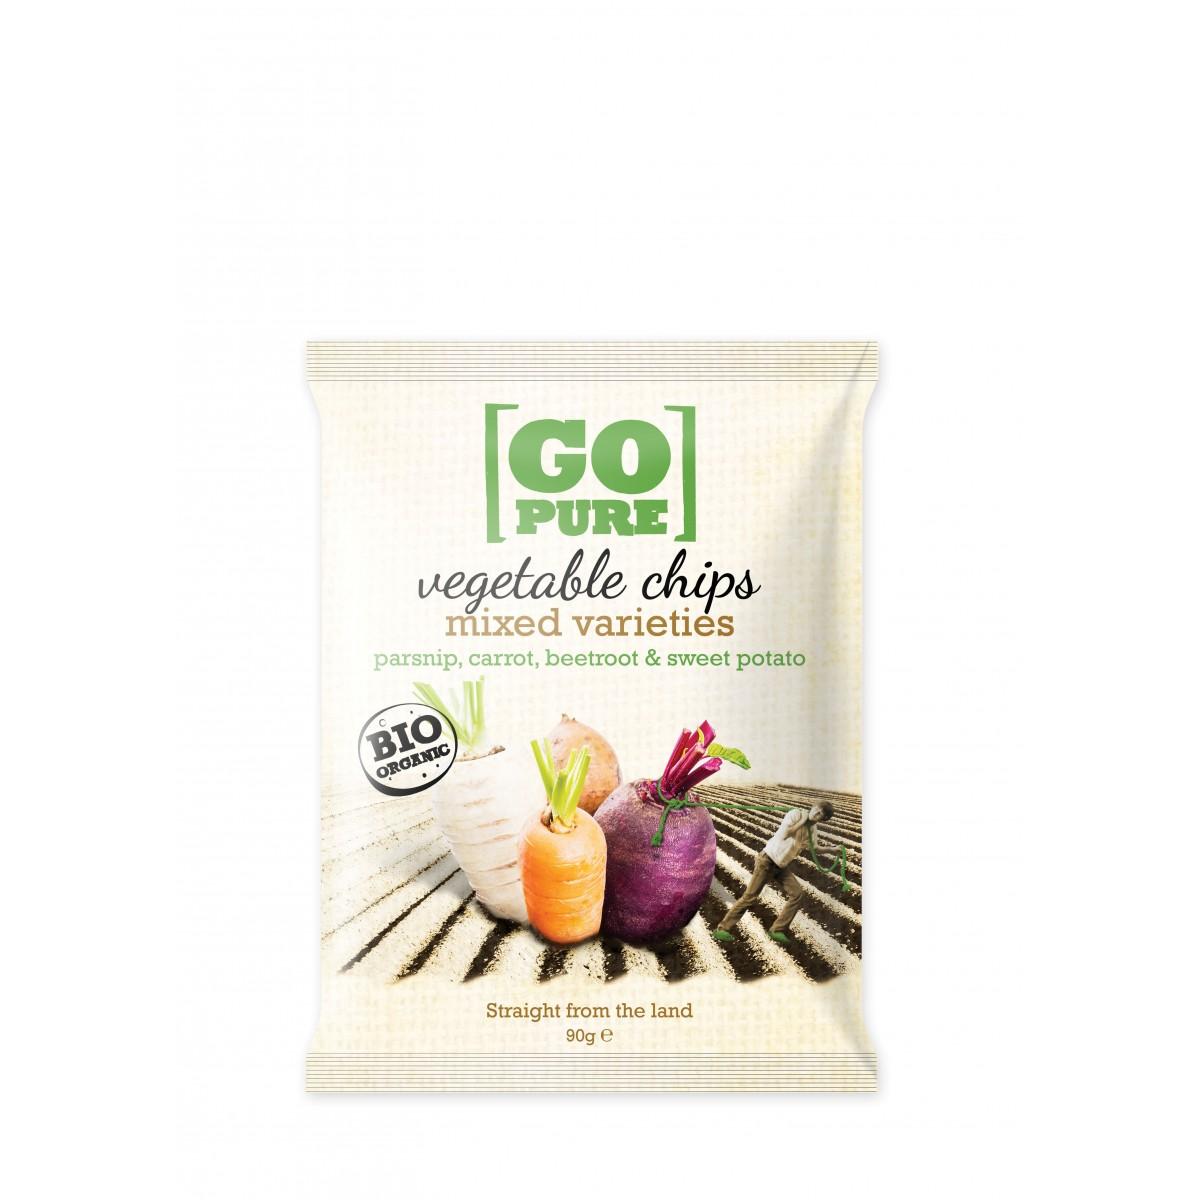 Vegetable Chips Mixed Varieties Parsnip, Carrot, Beetroot & Sweet Potato